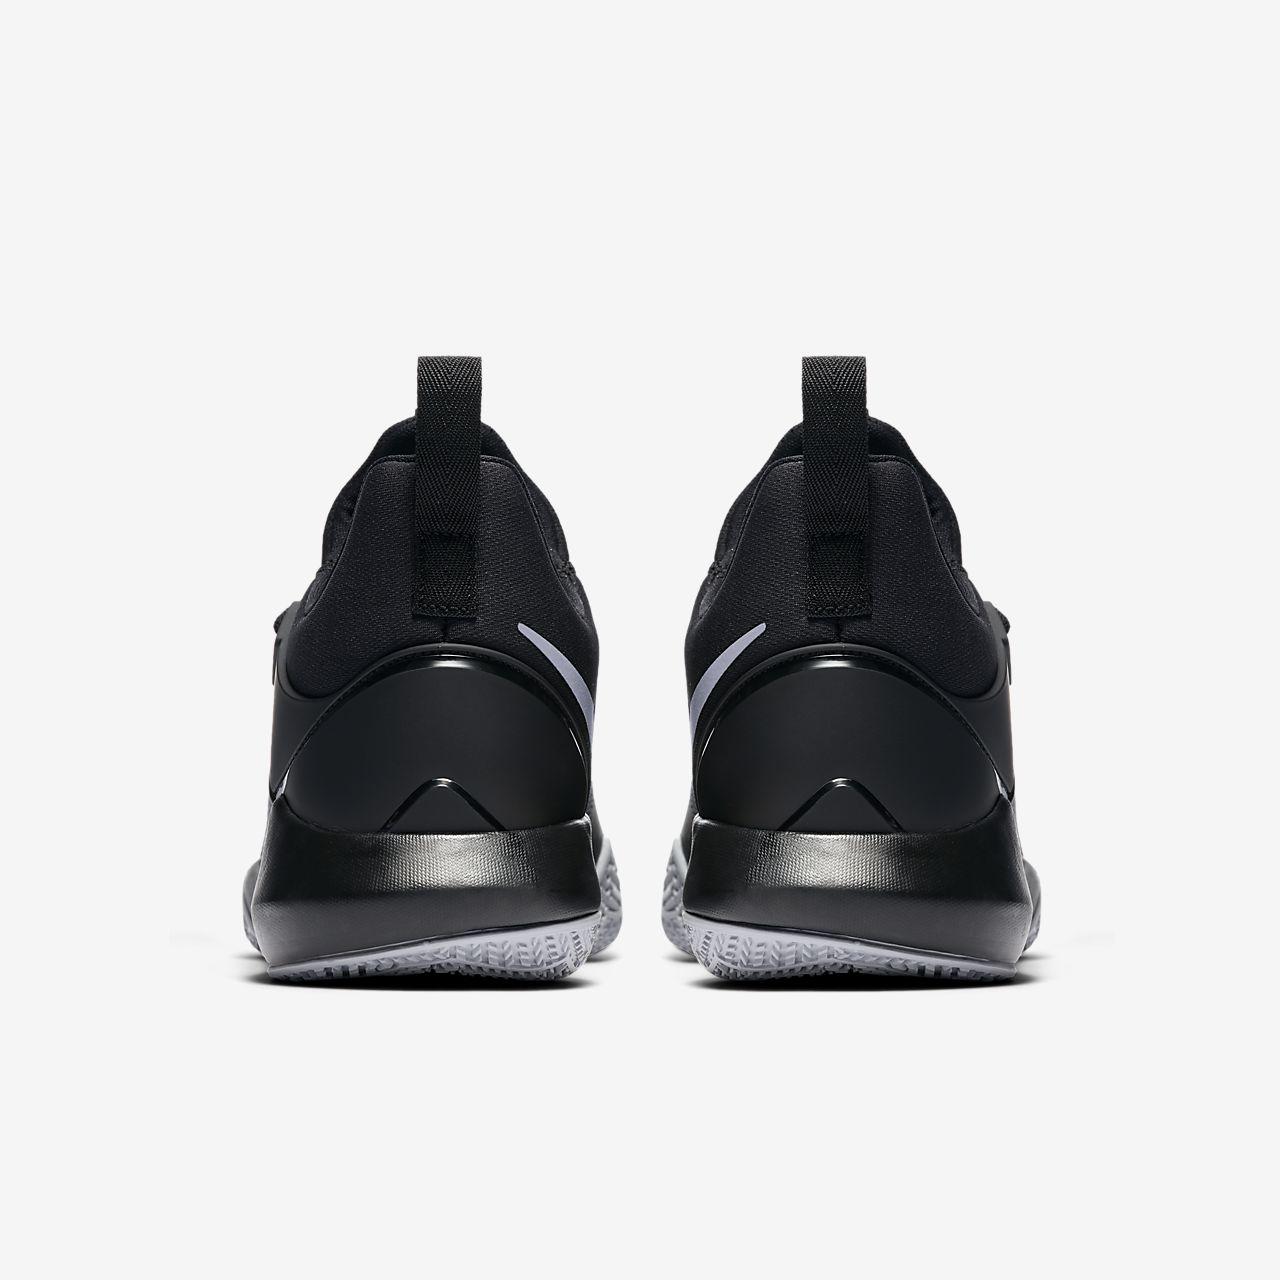 official photos 721d9 906b6 ... Nike Zoom Shift Women s Basketball Shoe